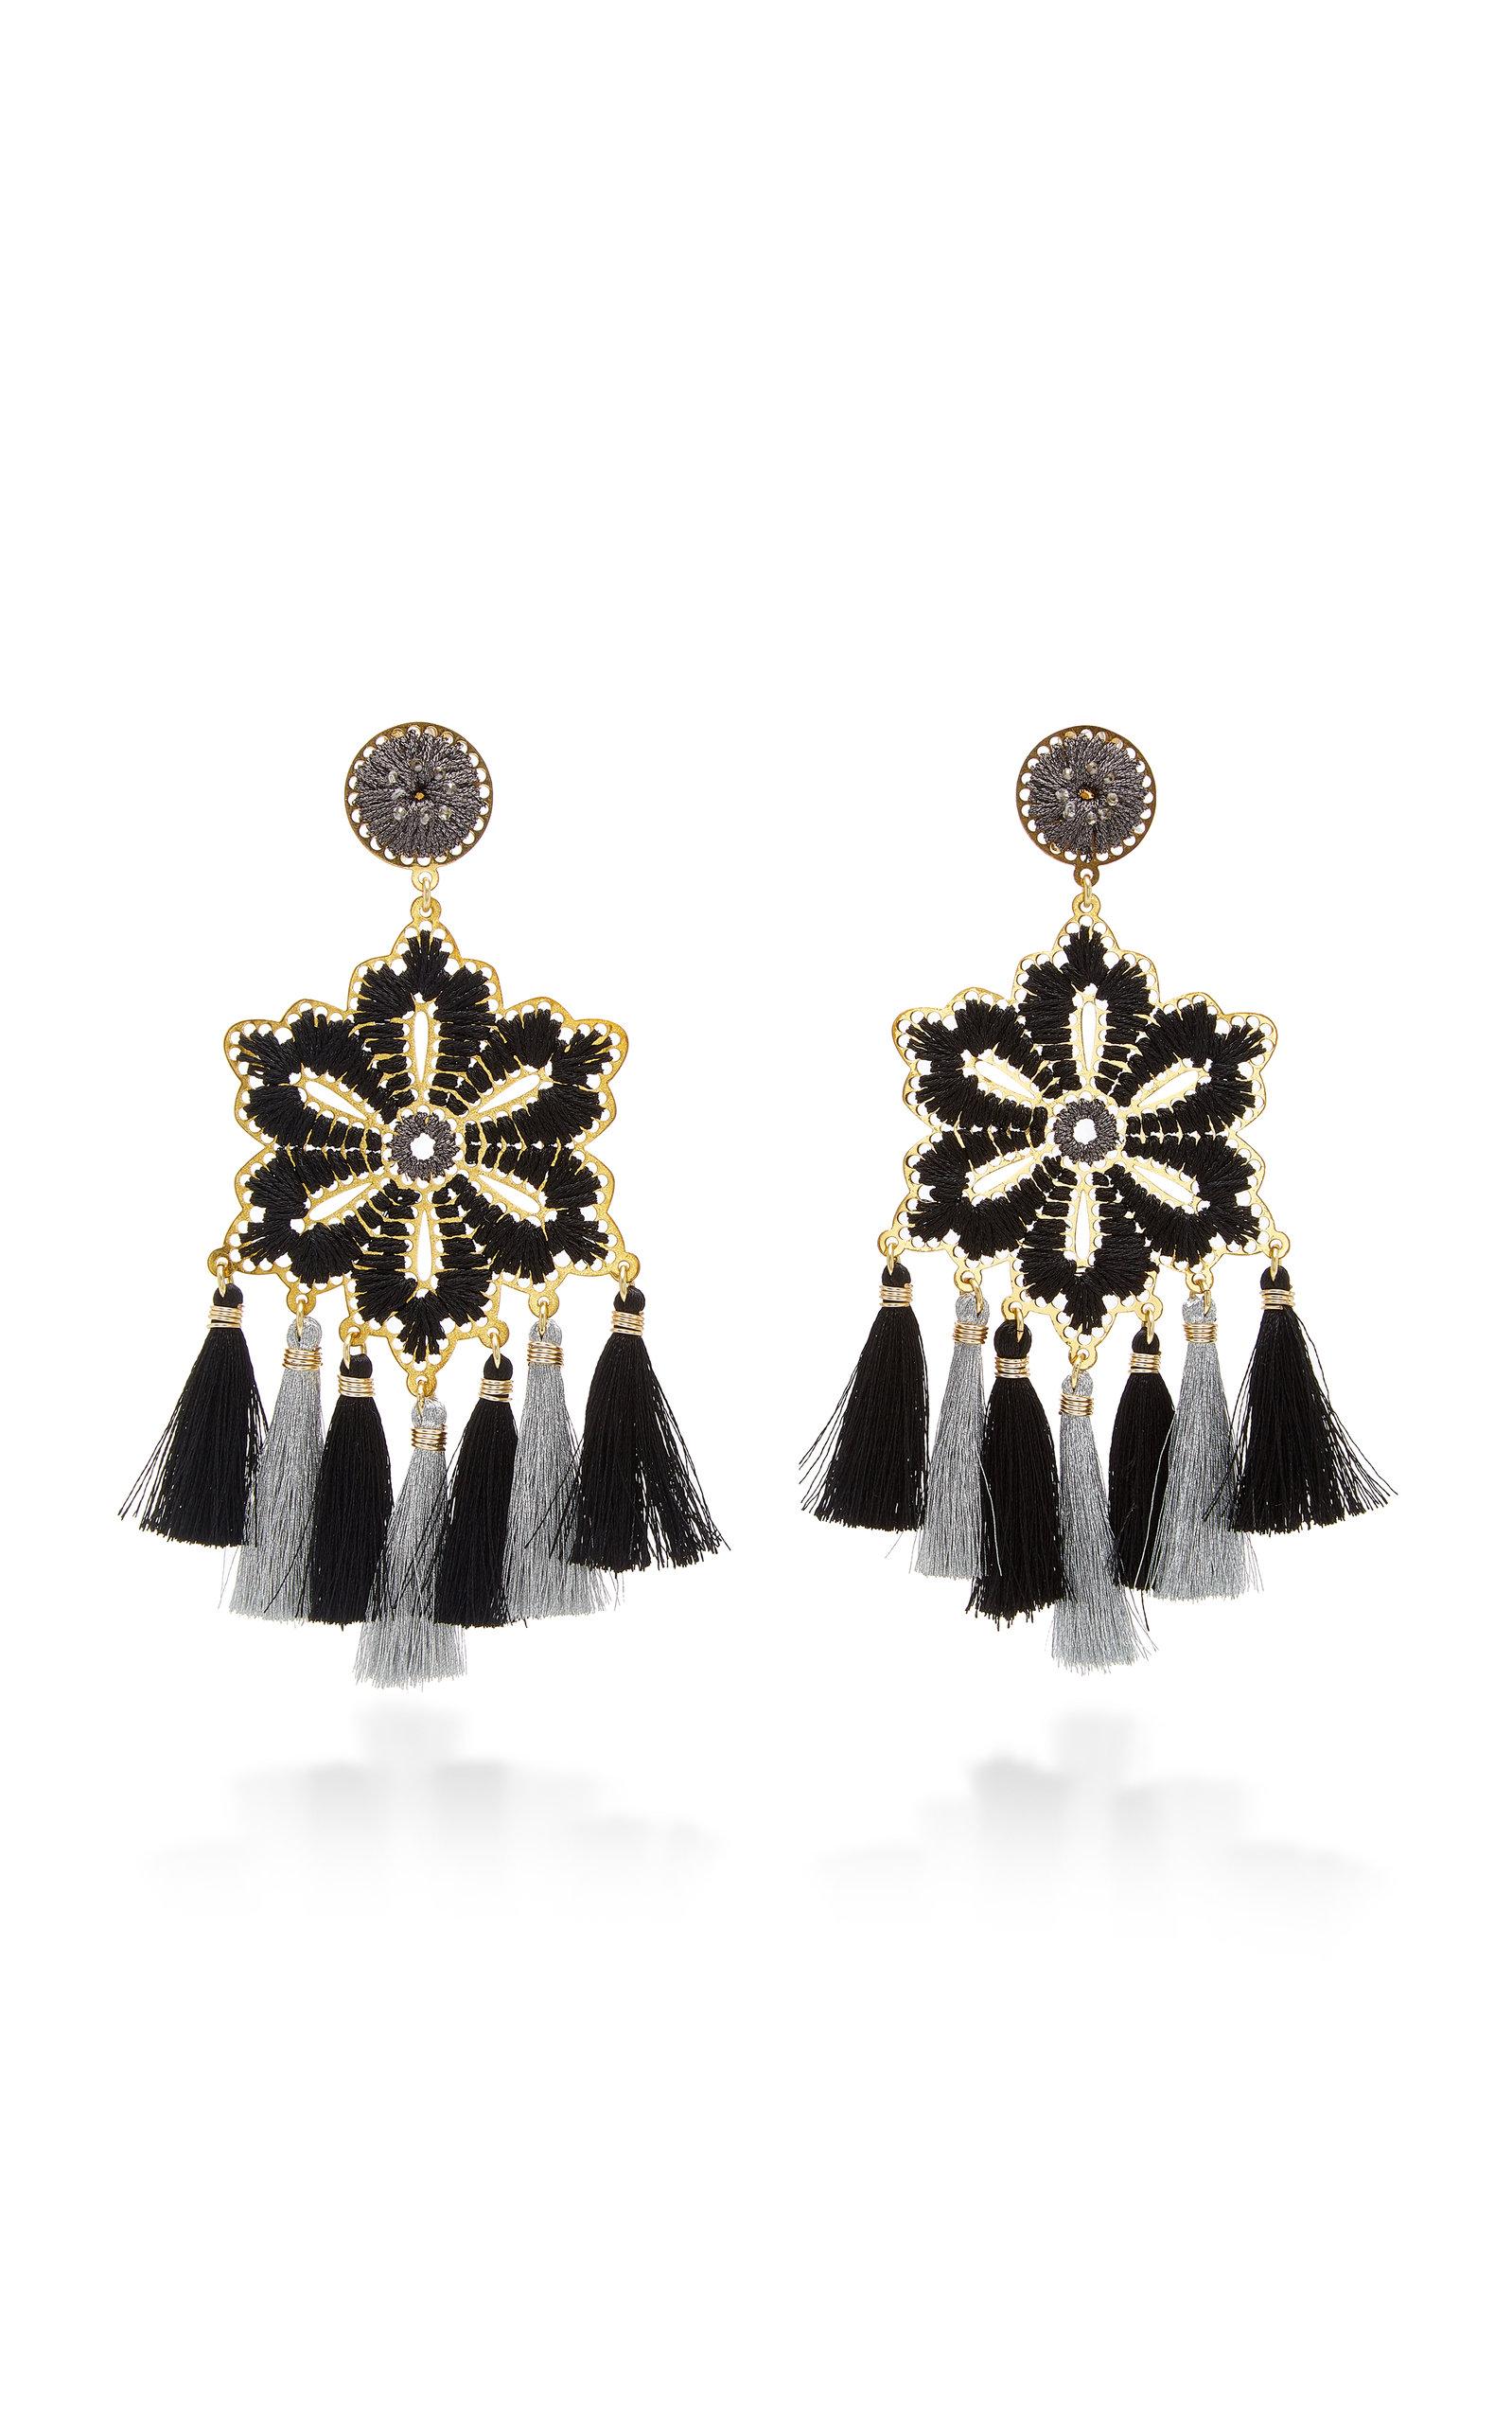 Mercedes Salazar Hibiscus Tasseled Gold-Tone Earrings qwvWk